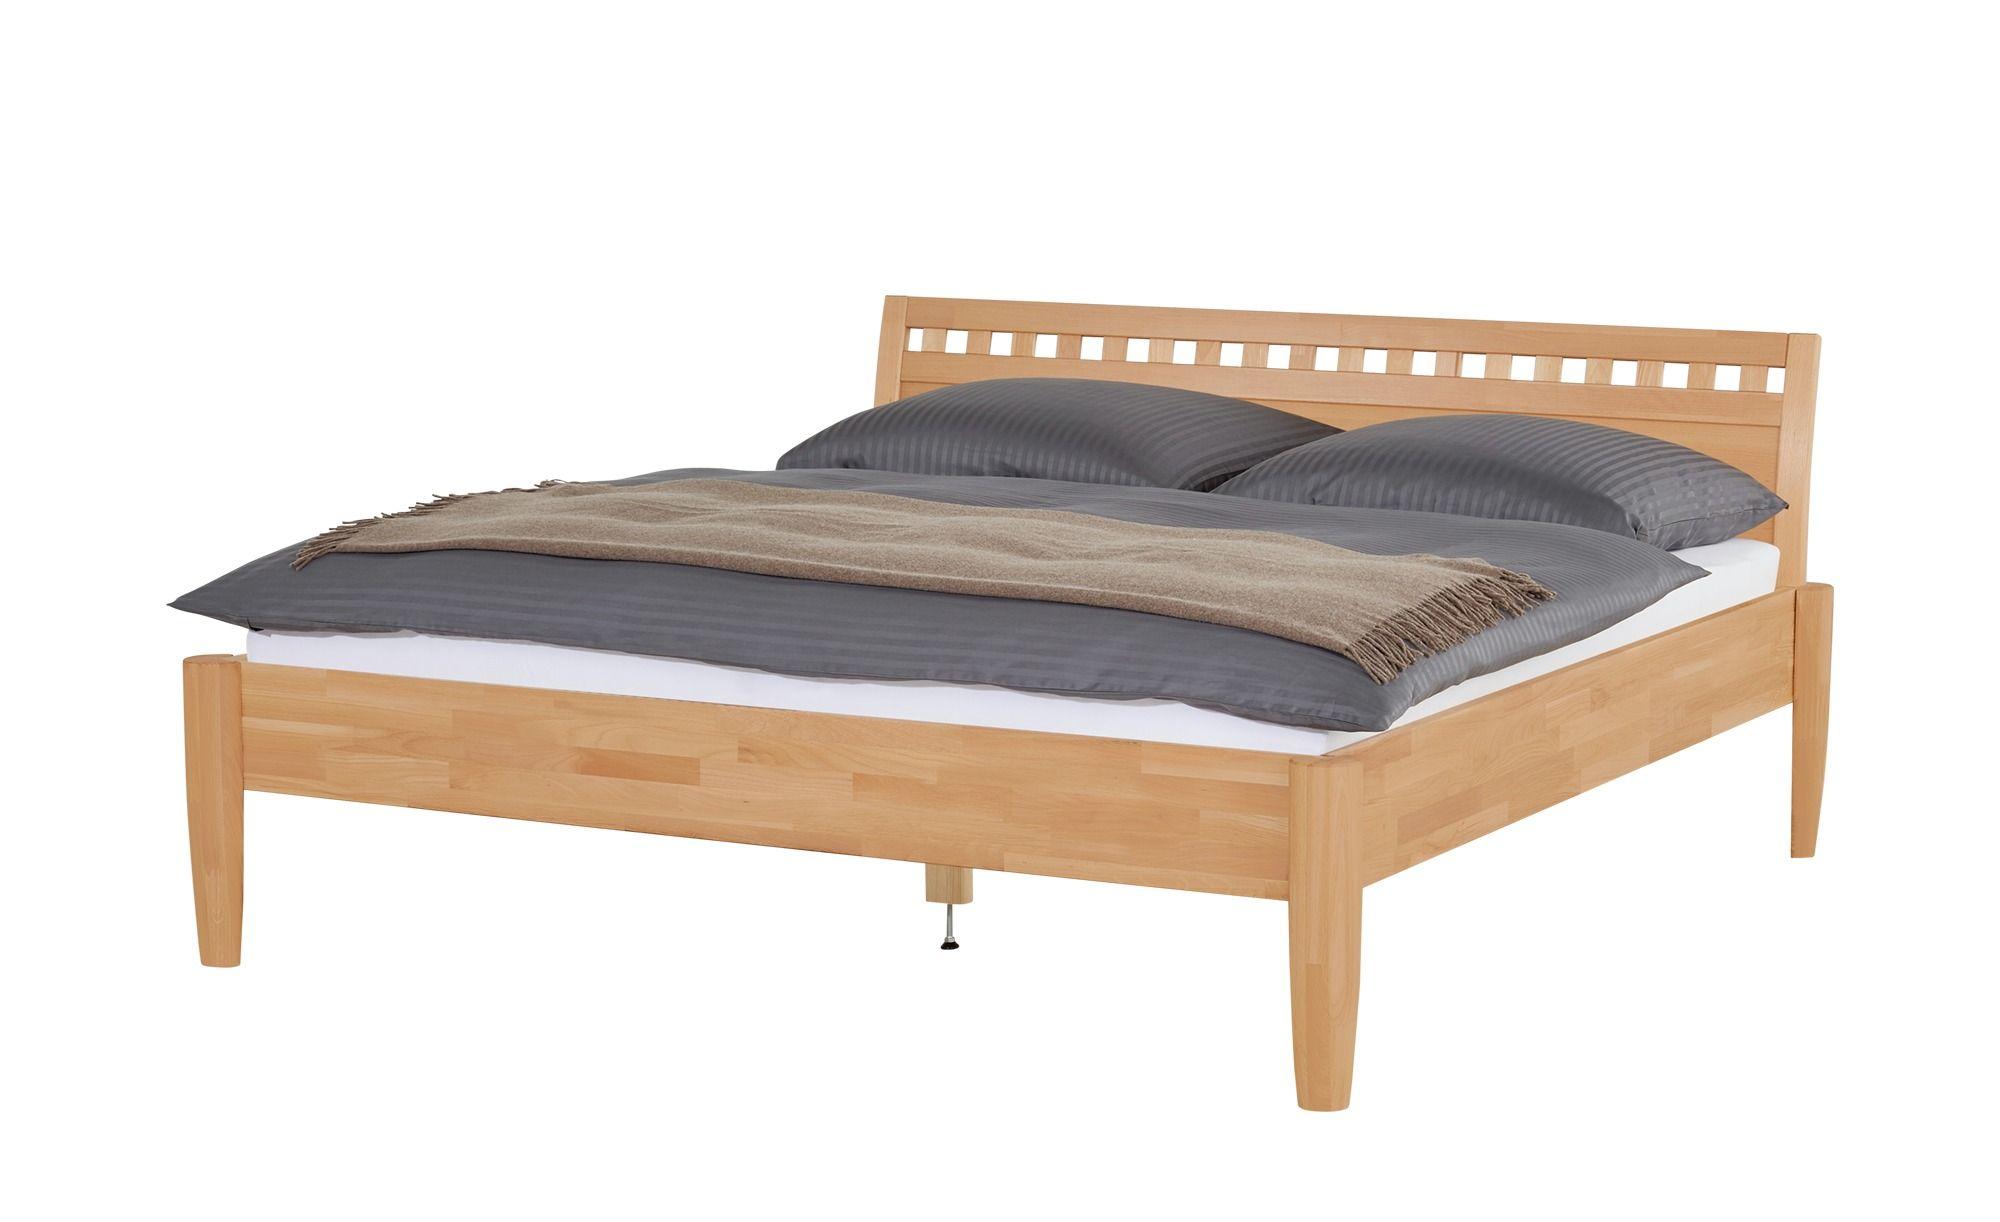 MassivholzBettgestell Timber Bettgestell, Bett und